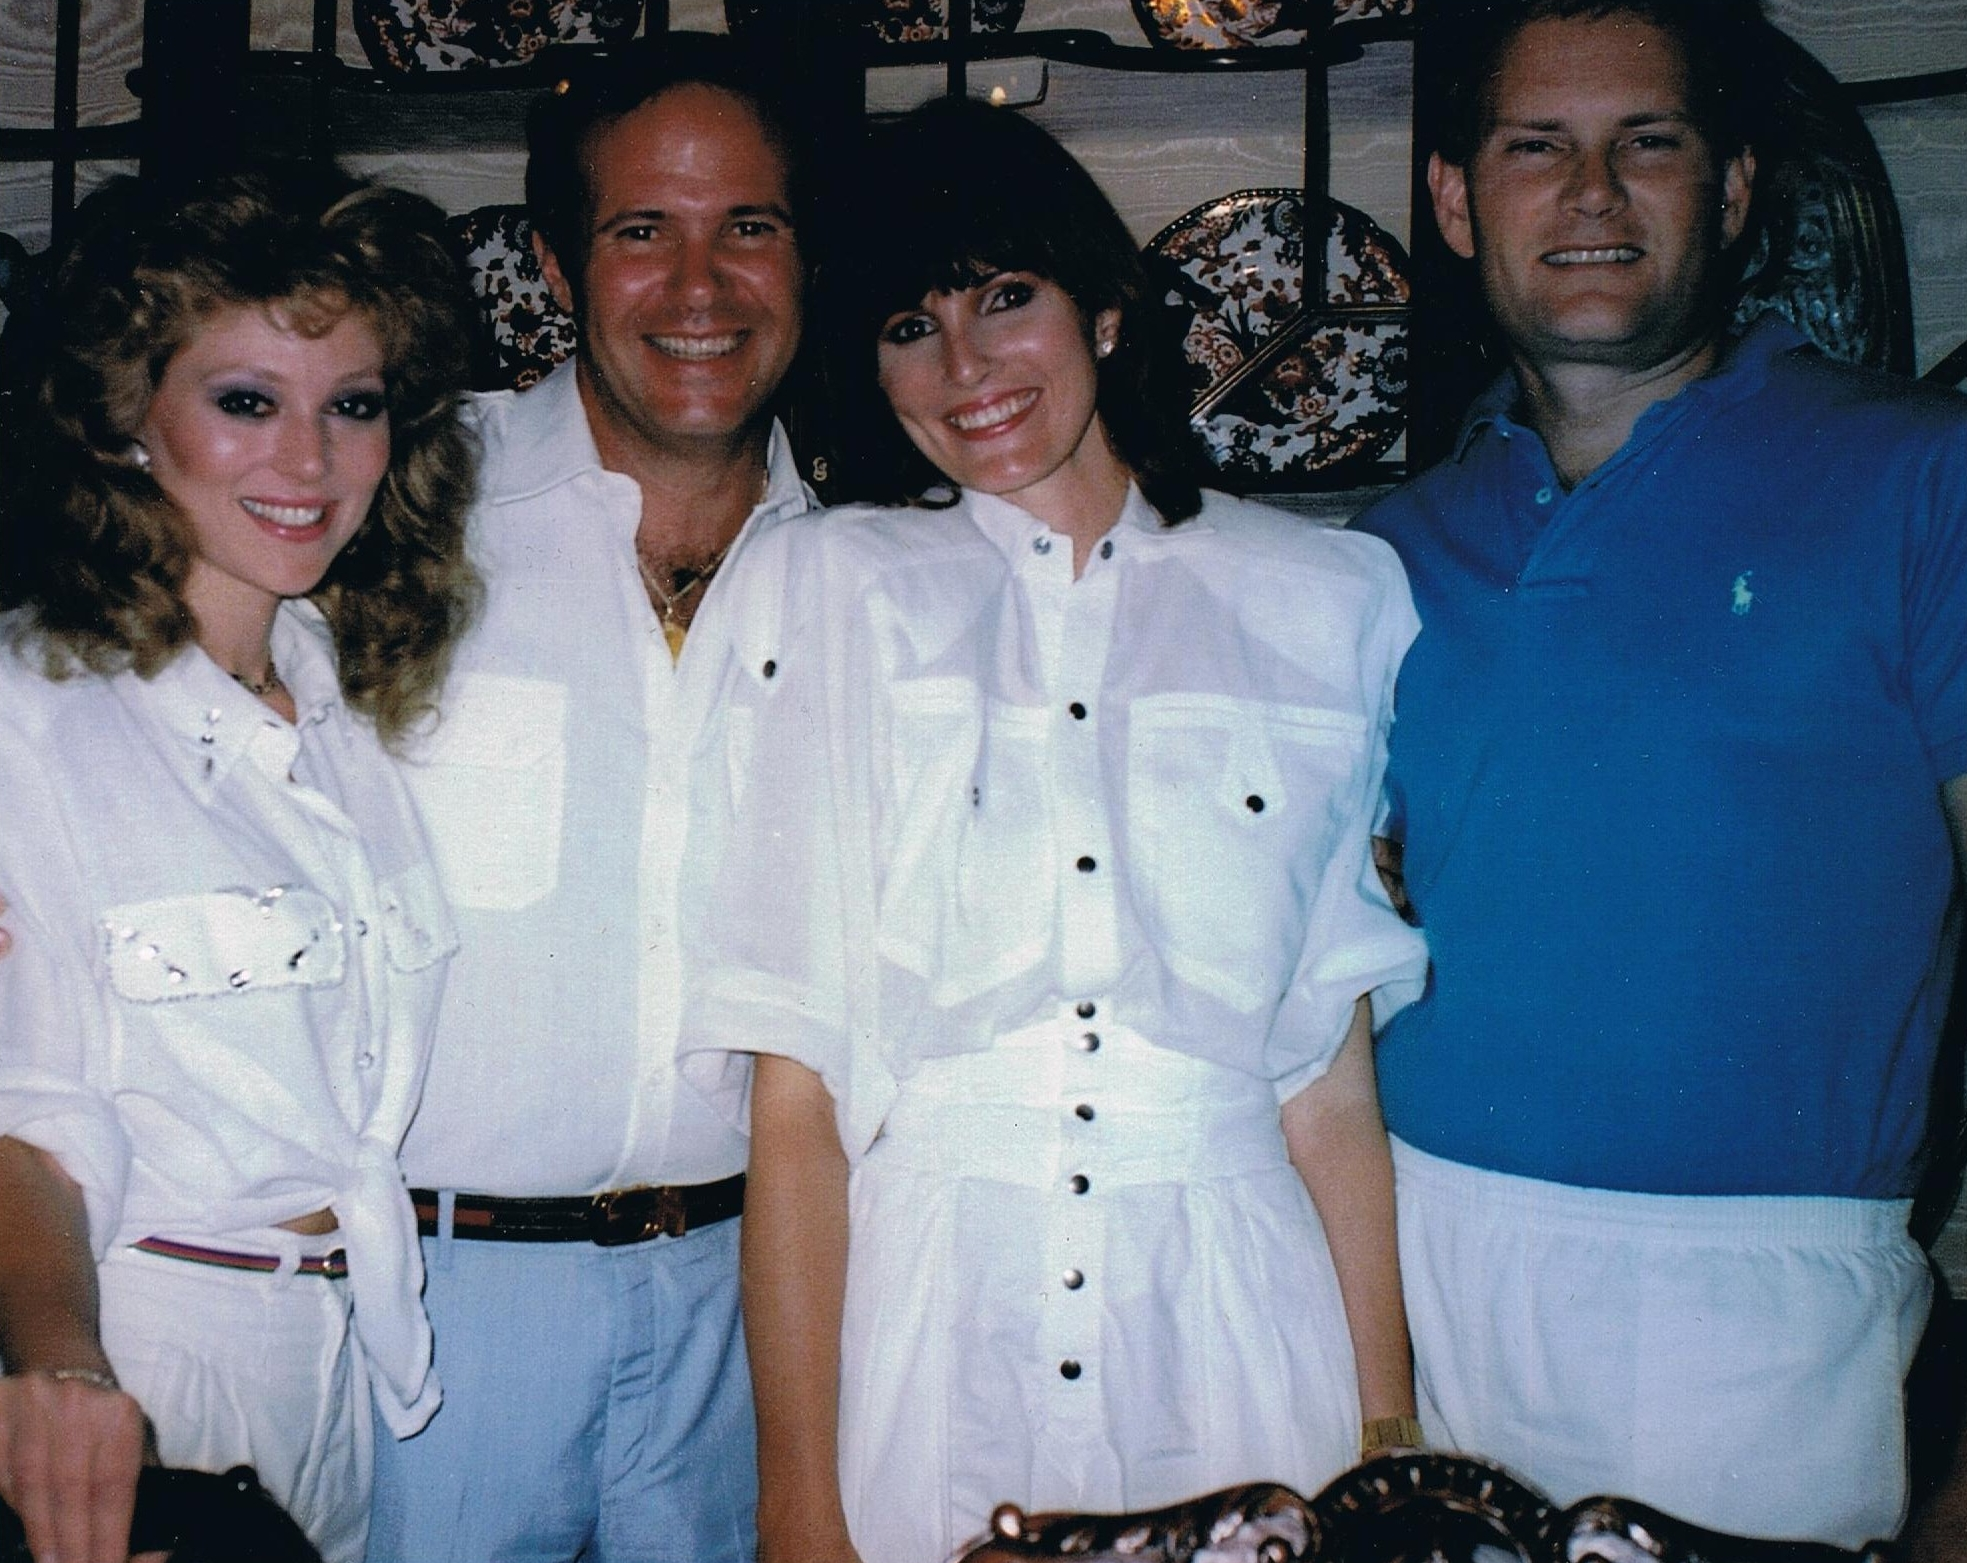 Audrey Landers Dallas fan fave: dallas residents share memories of audrey landers